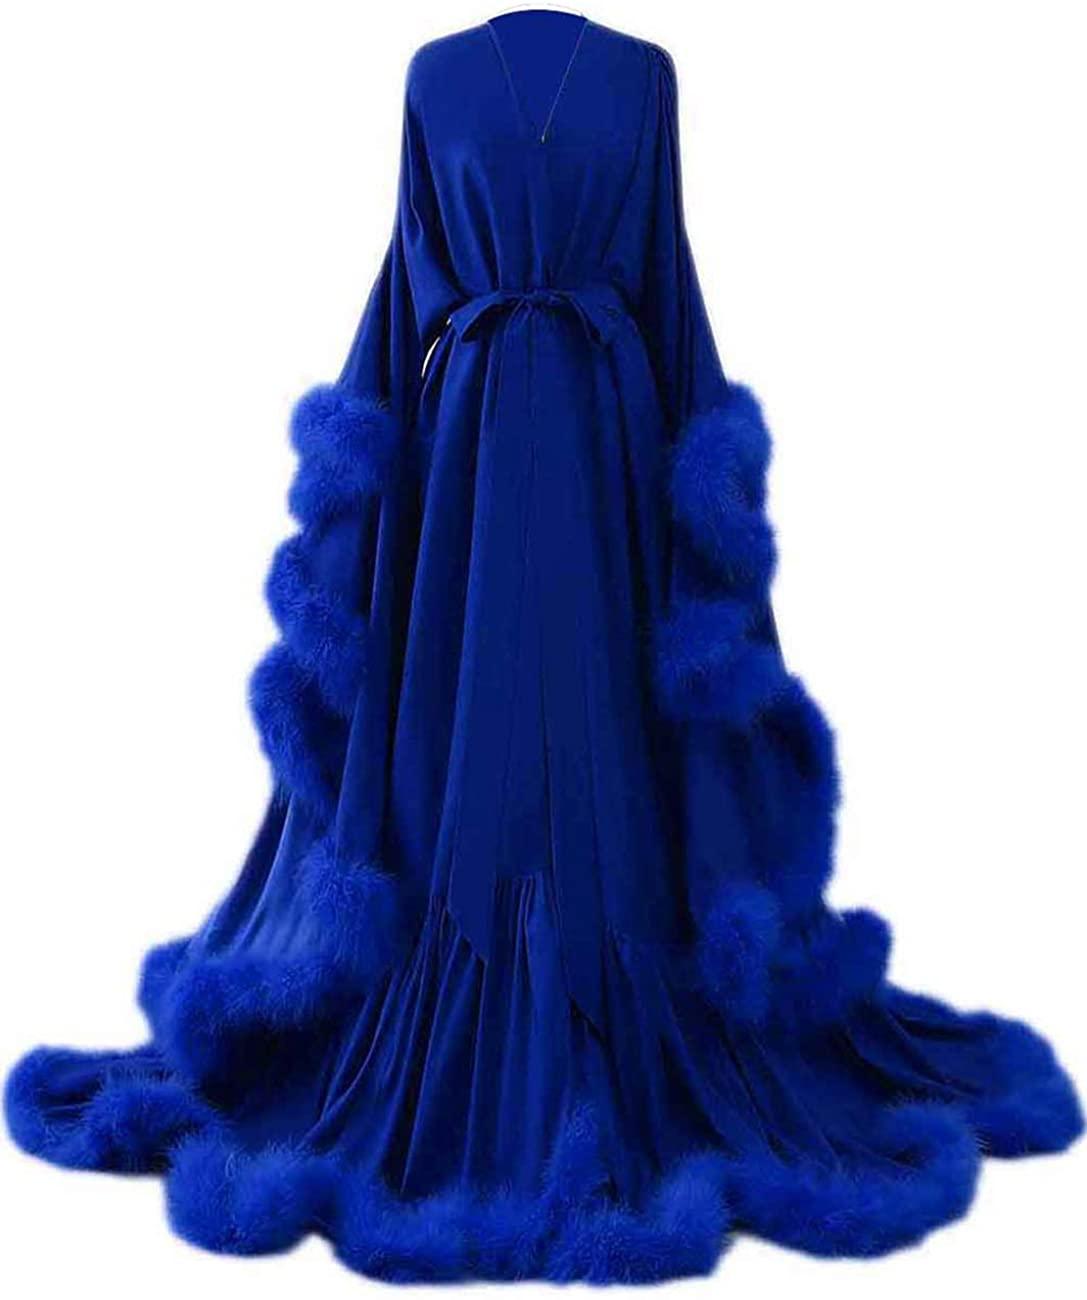 Women's Feather Bridal Robe Wedding Scarf Long Lingerie Robe Nightgown Bathrobe Sleepwear with Belt